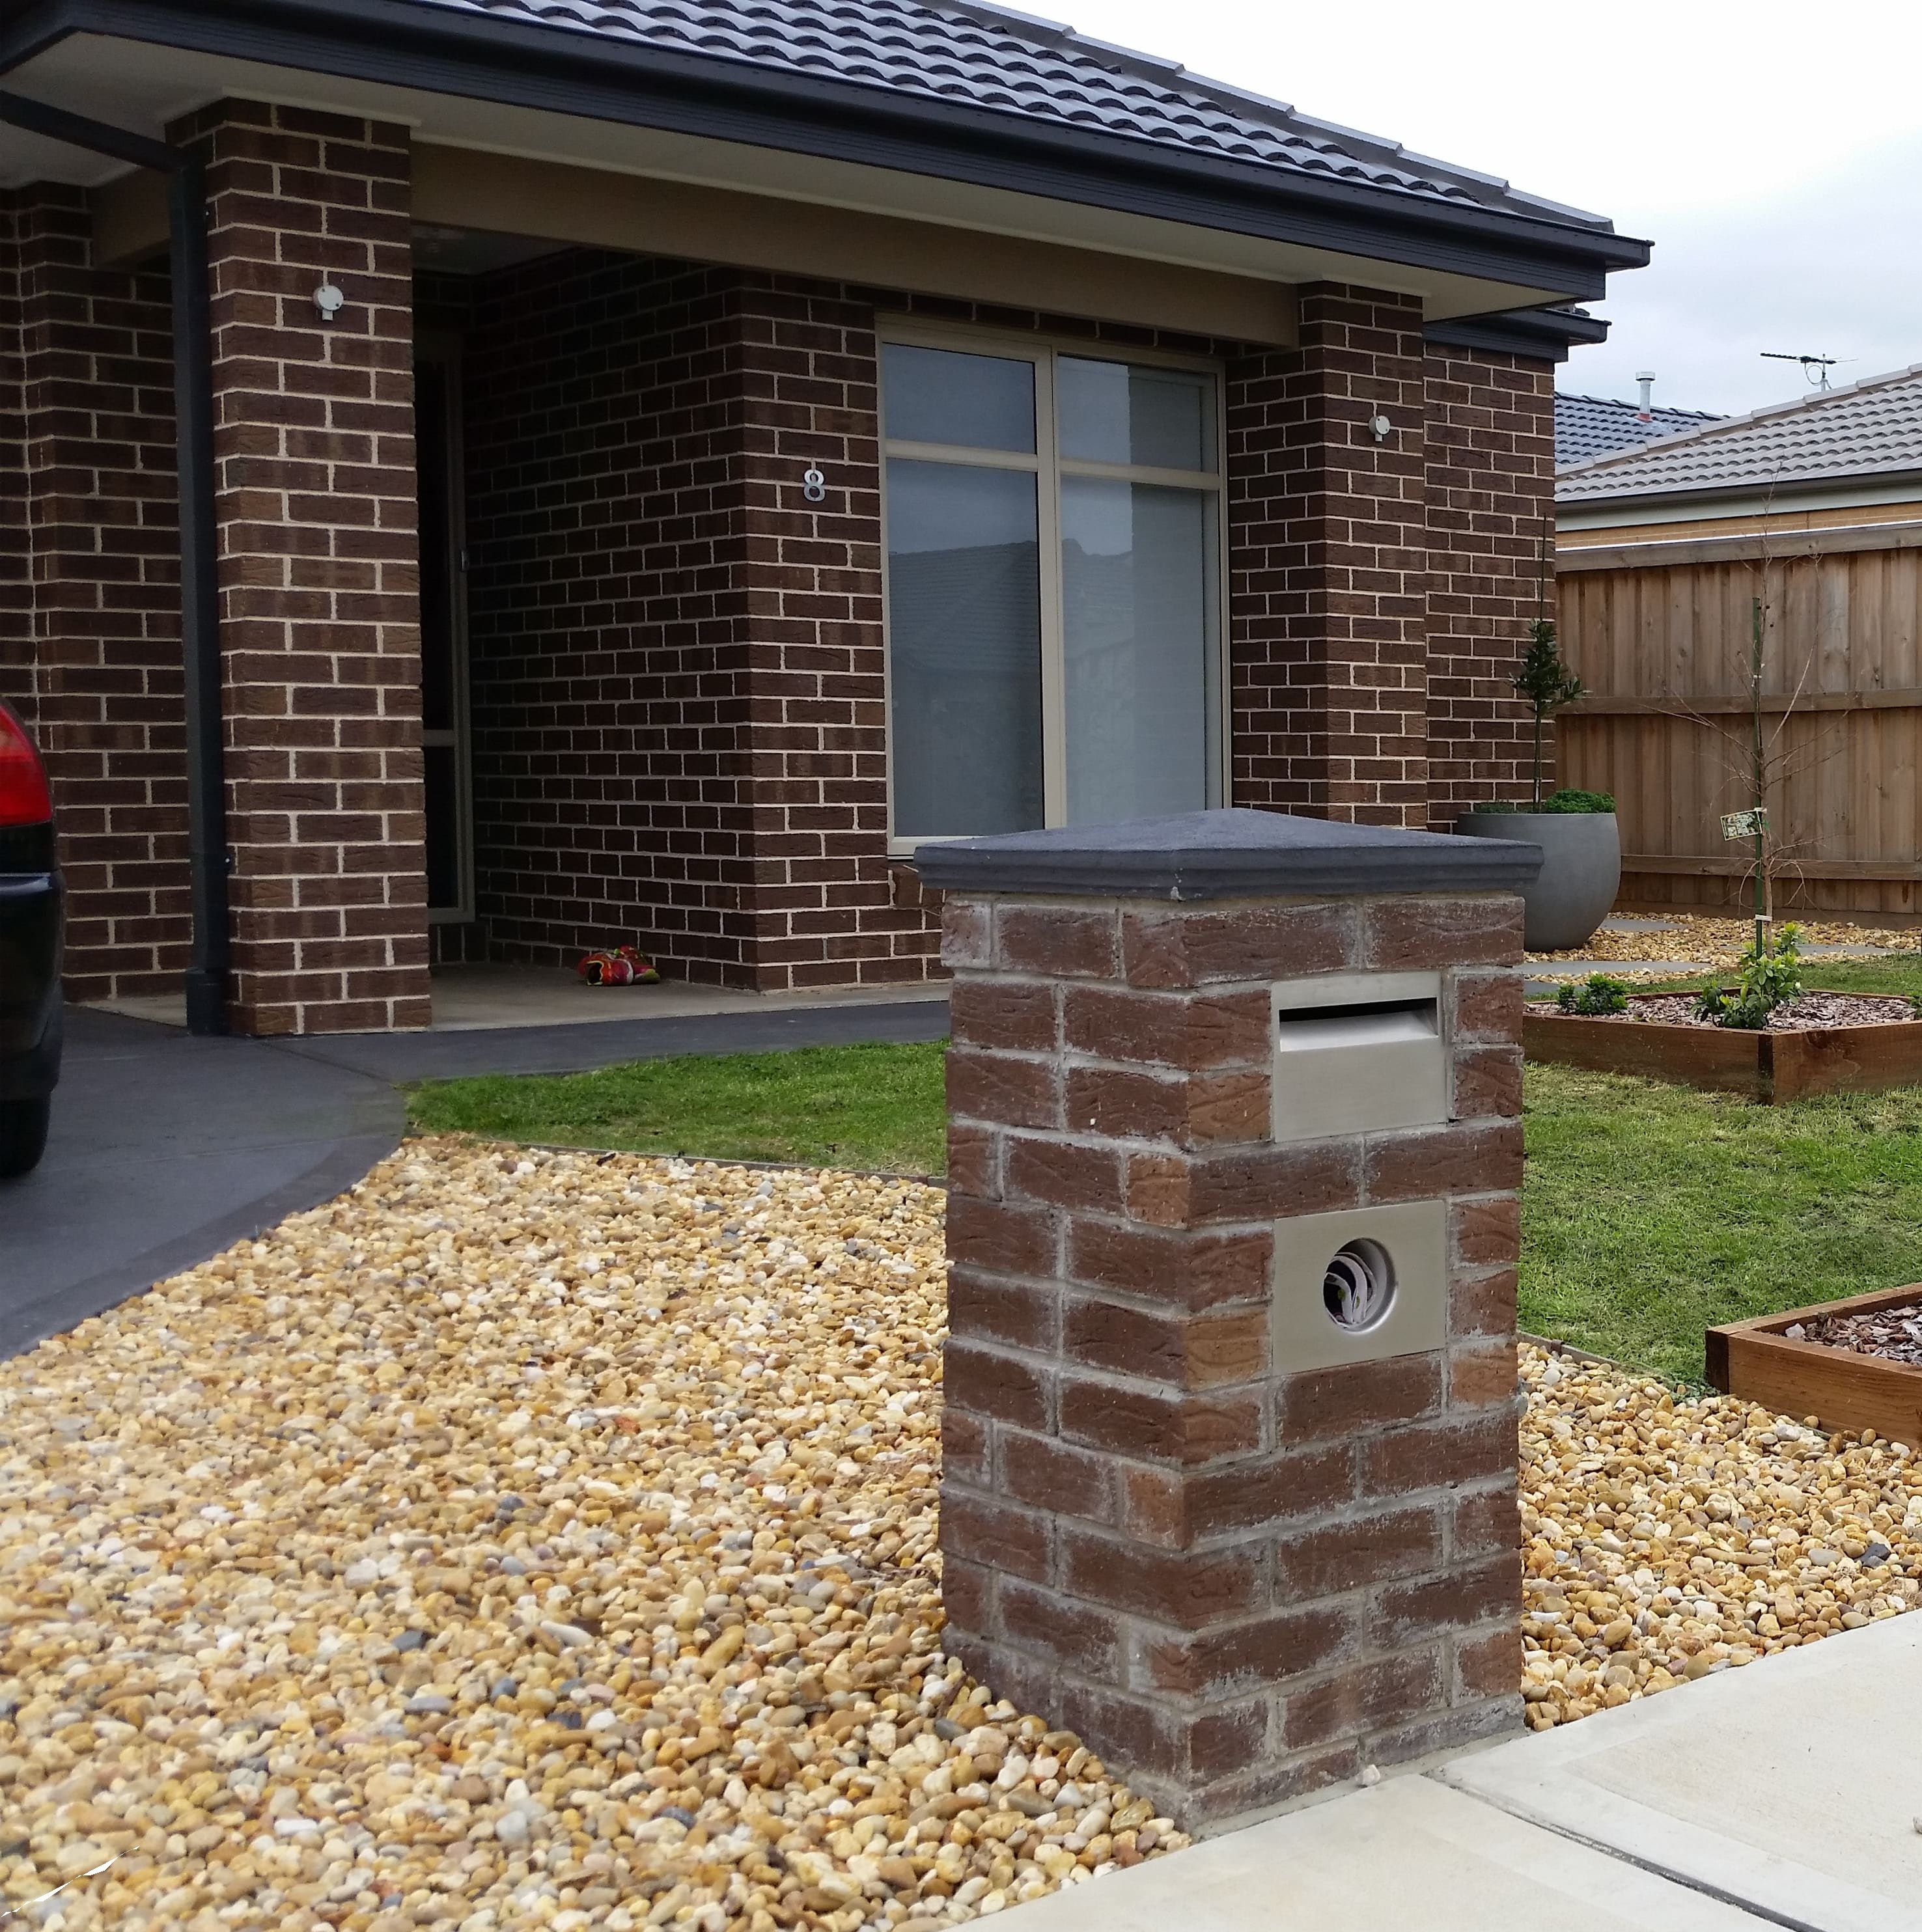 Garage Door Landscaping Ideas: Brick Mailbox, Mailbox Landscaping, Mailbox